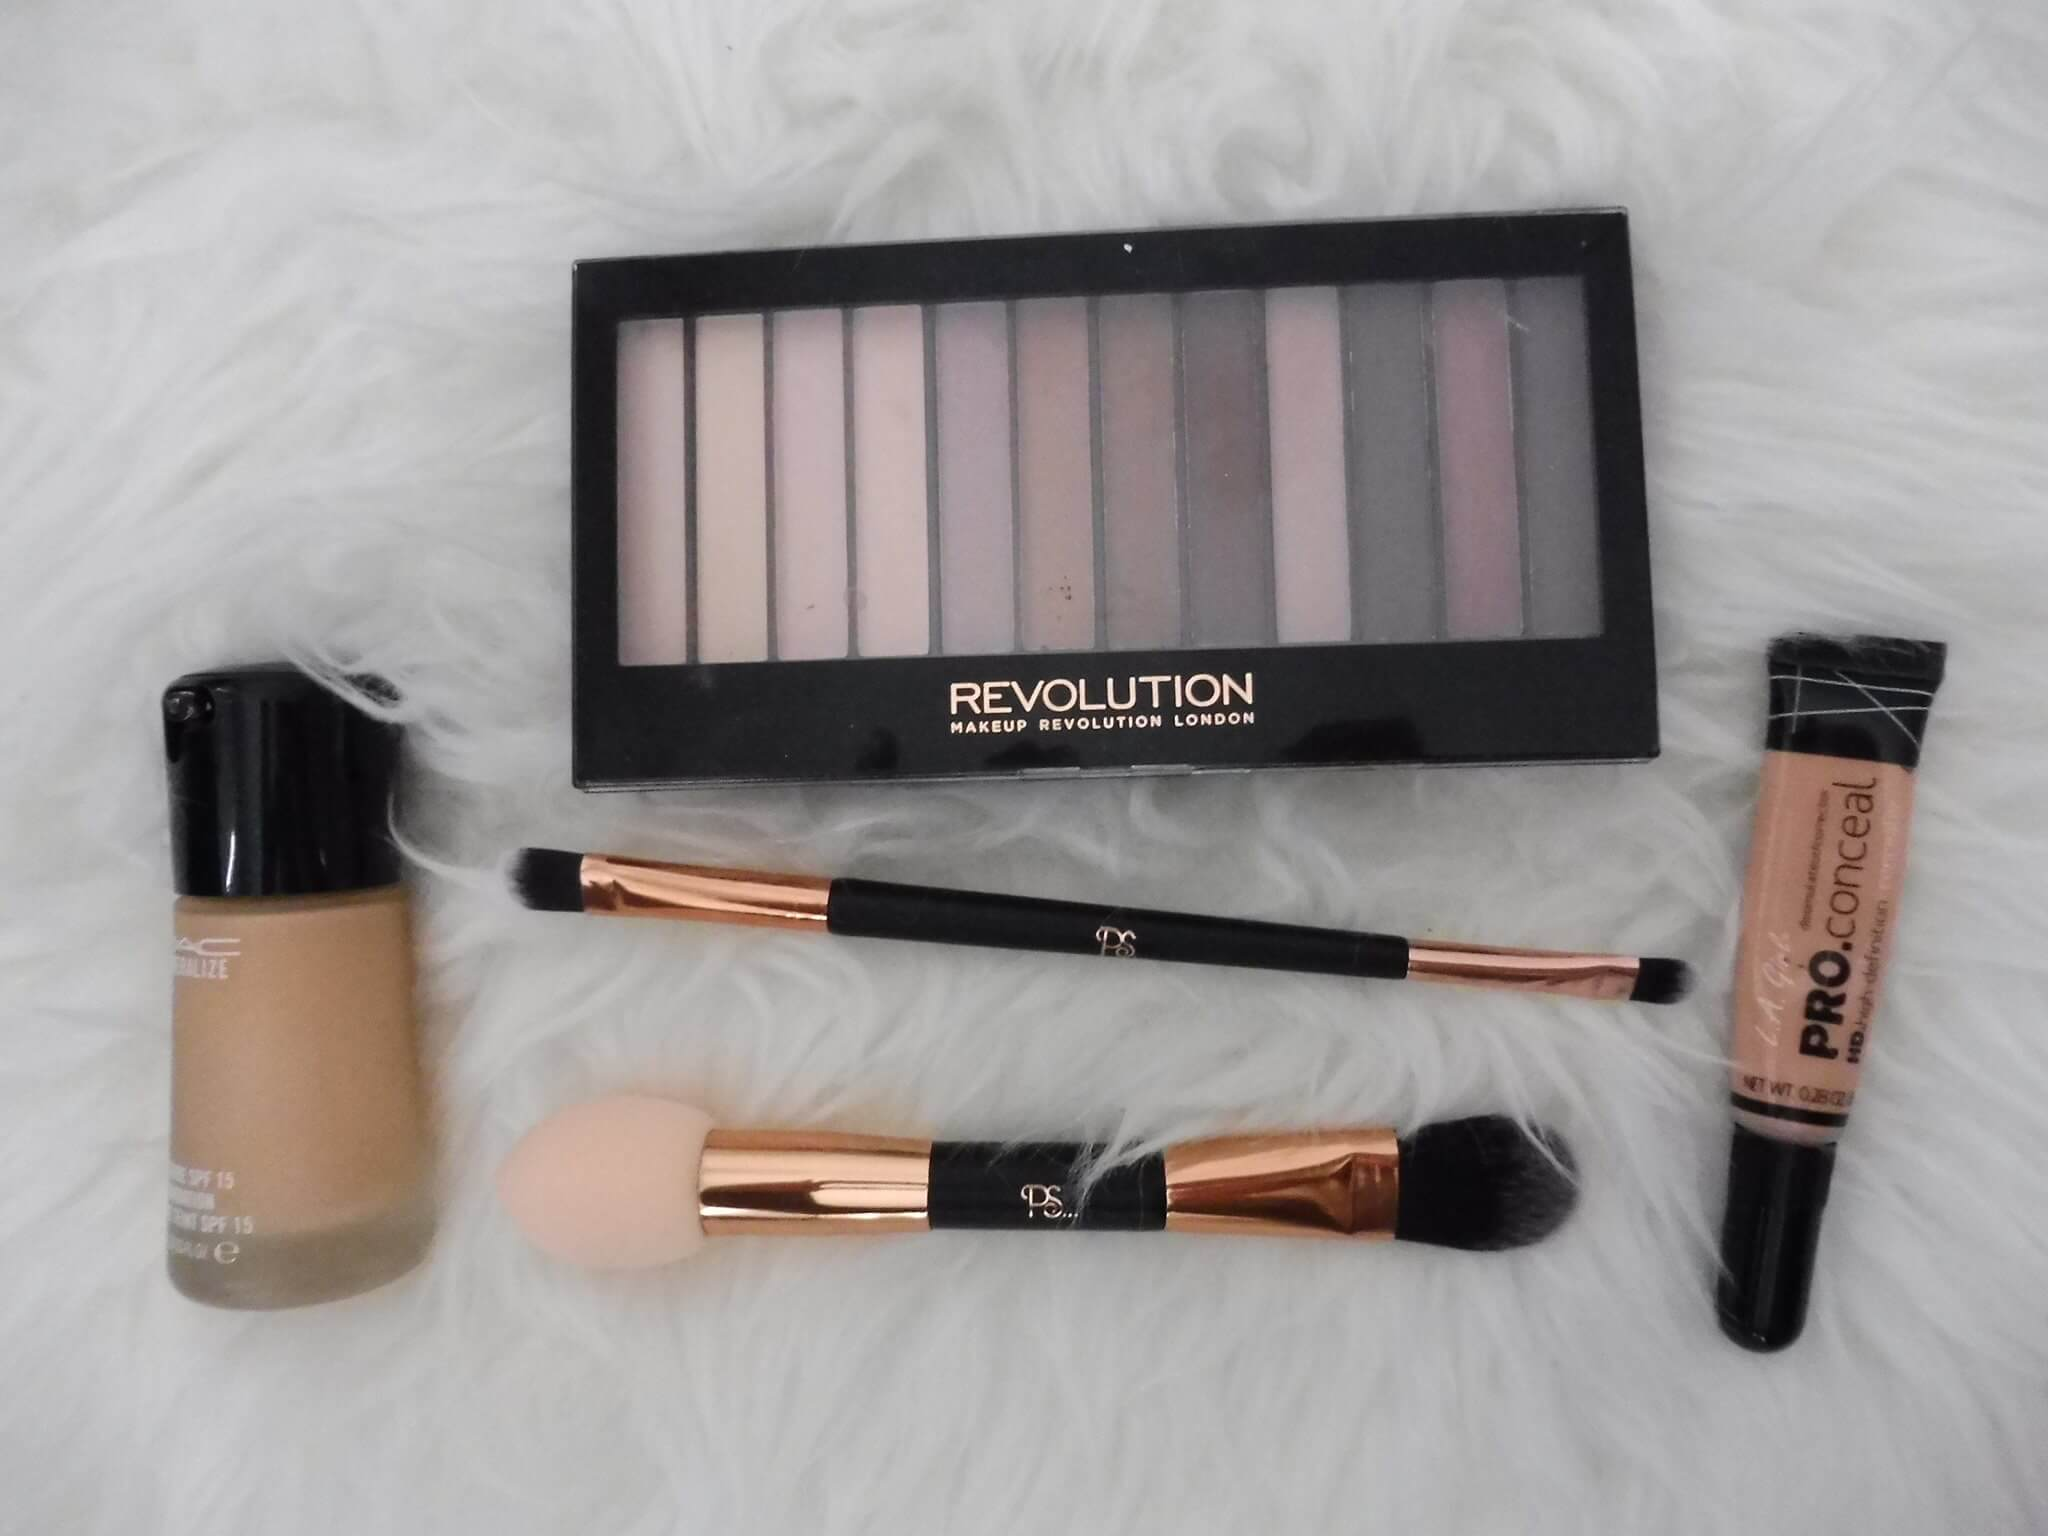 Primark Make-up Brush